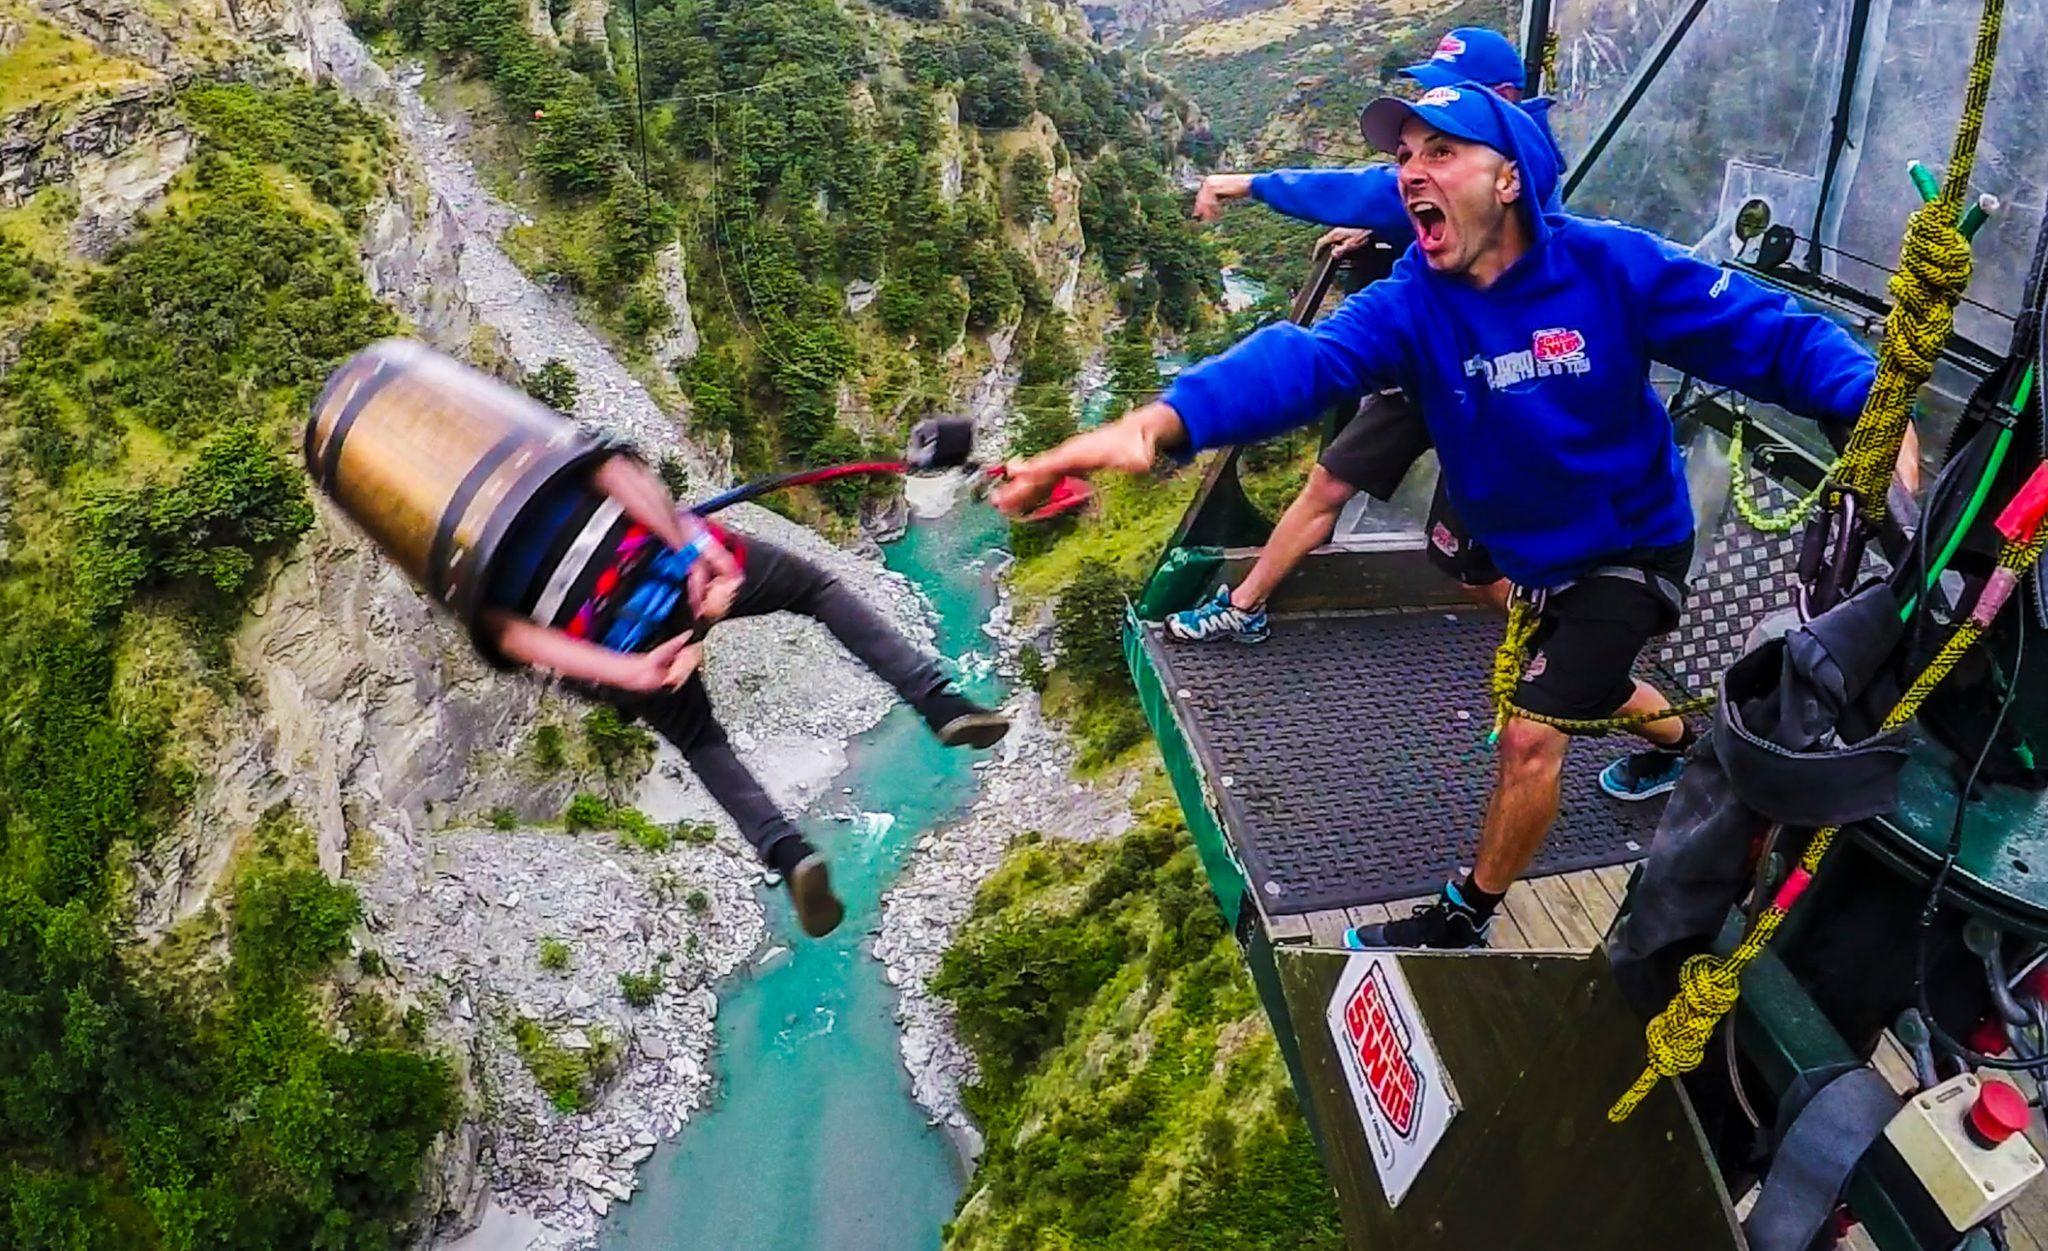 Top 5 Extreme Activities in New Zealand